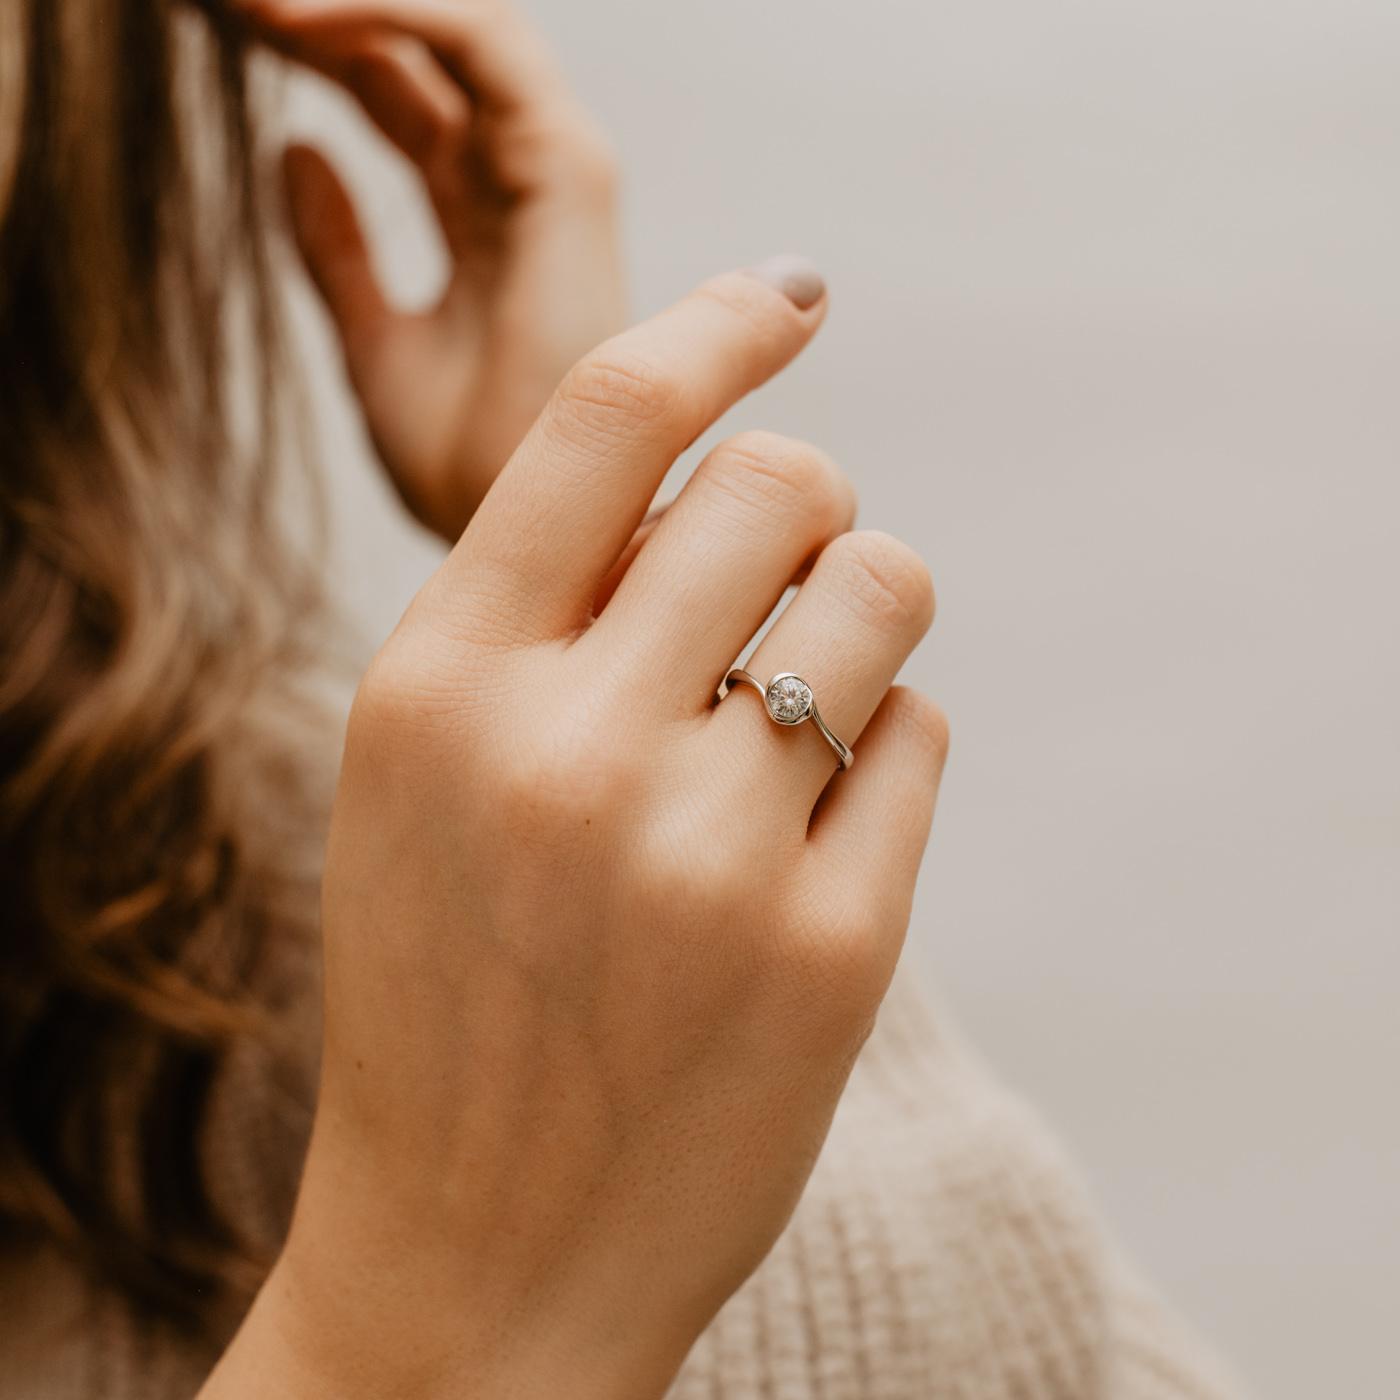 Rosebud Solitaire Engagement Ring | Kalika | Ethica Diamonds UK